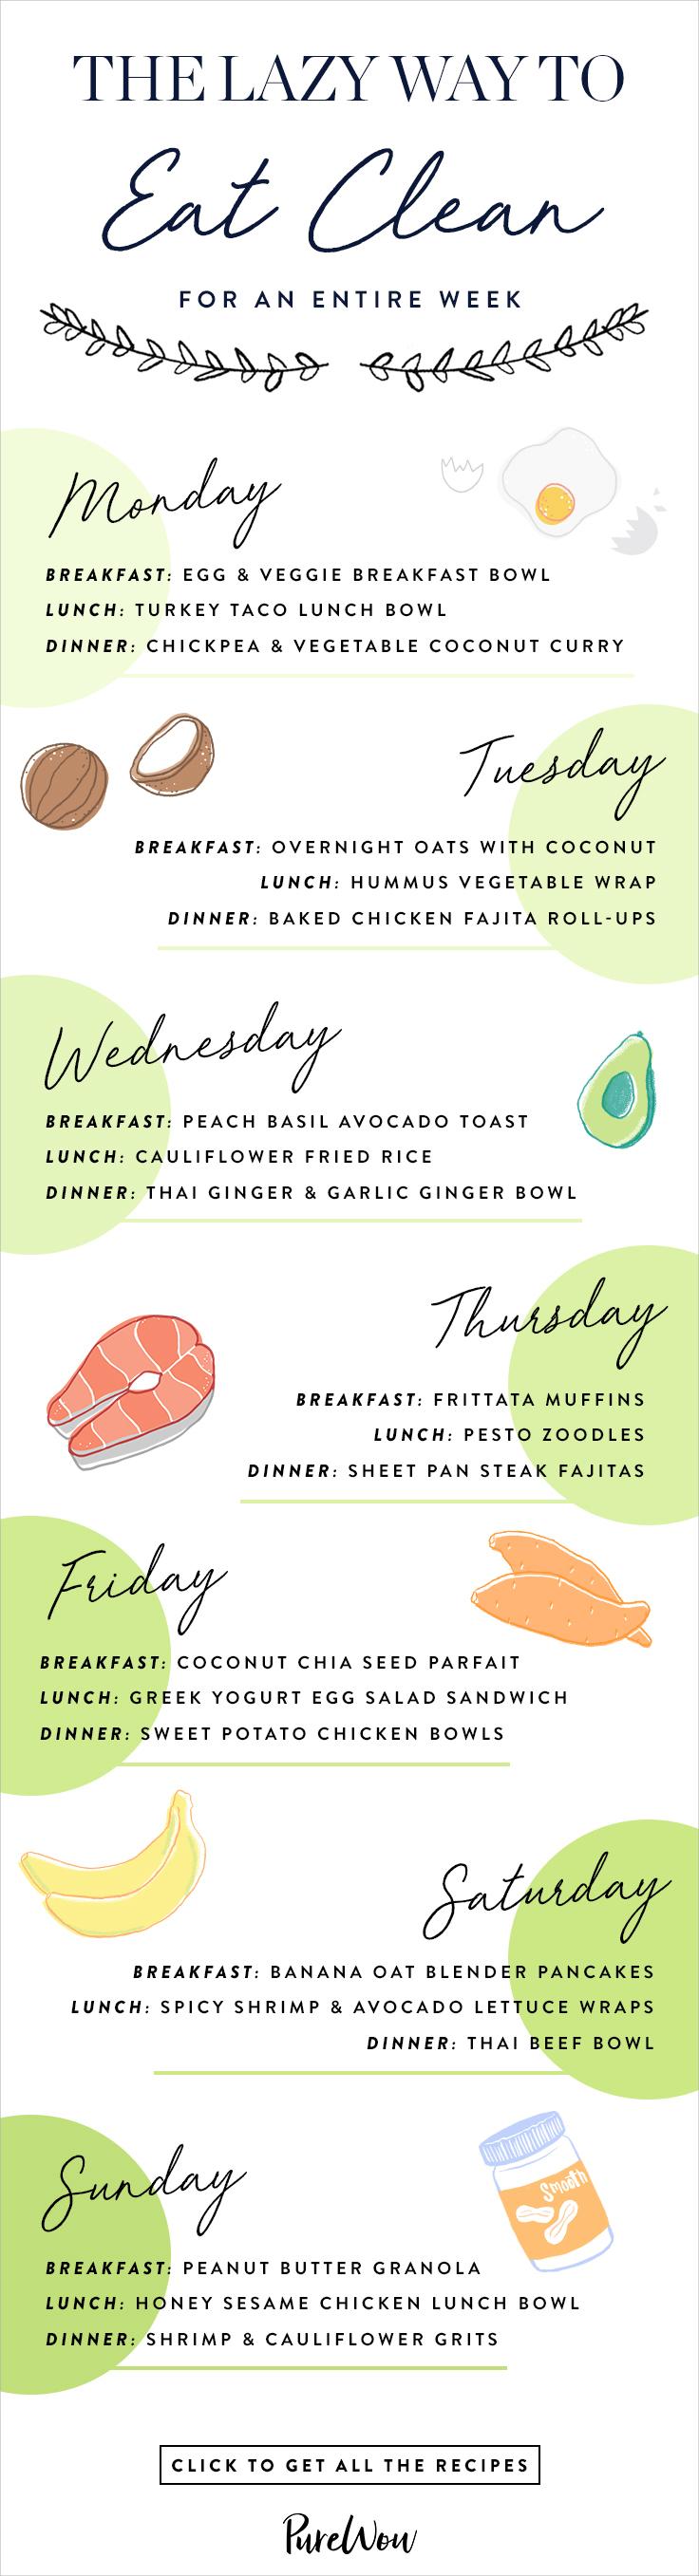 Eat Clean Recipe List.jpg